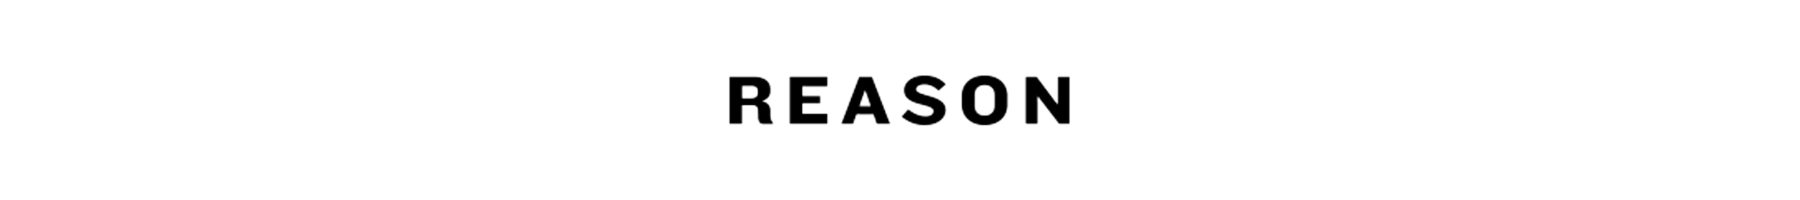 DrJays.com - Reason